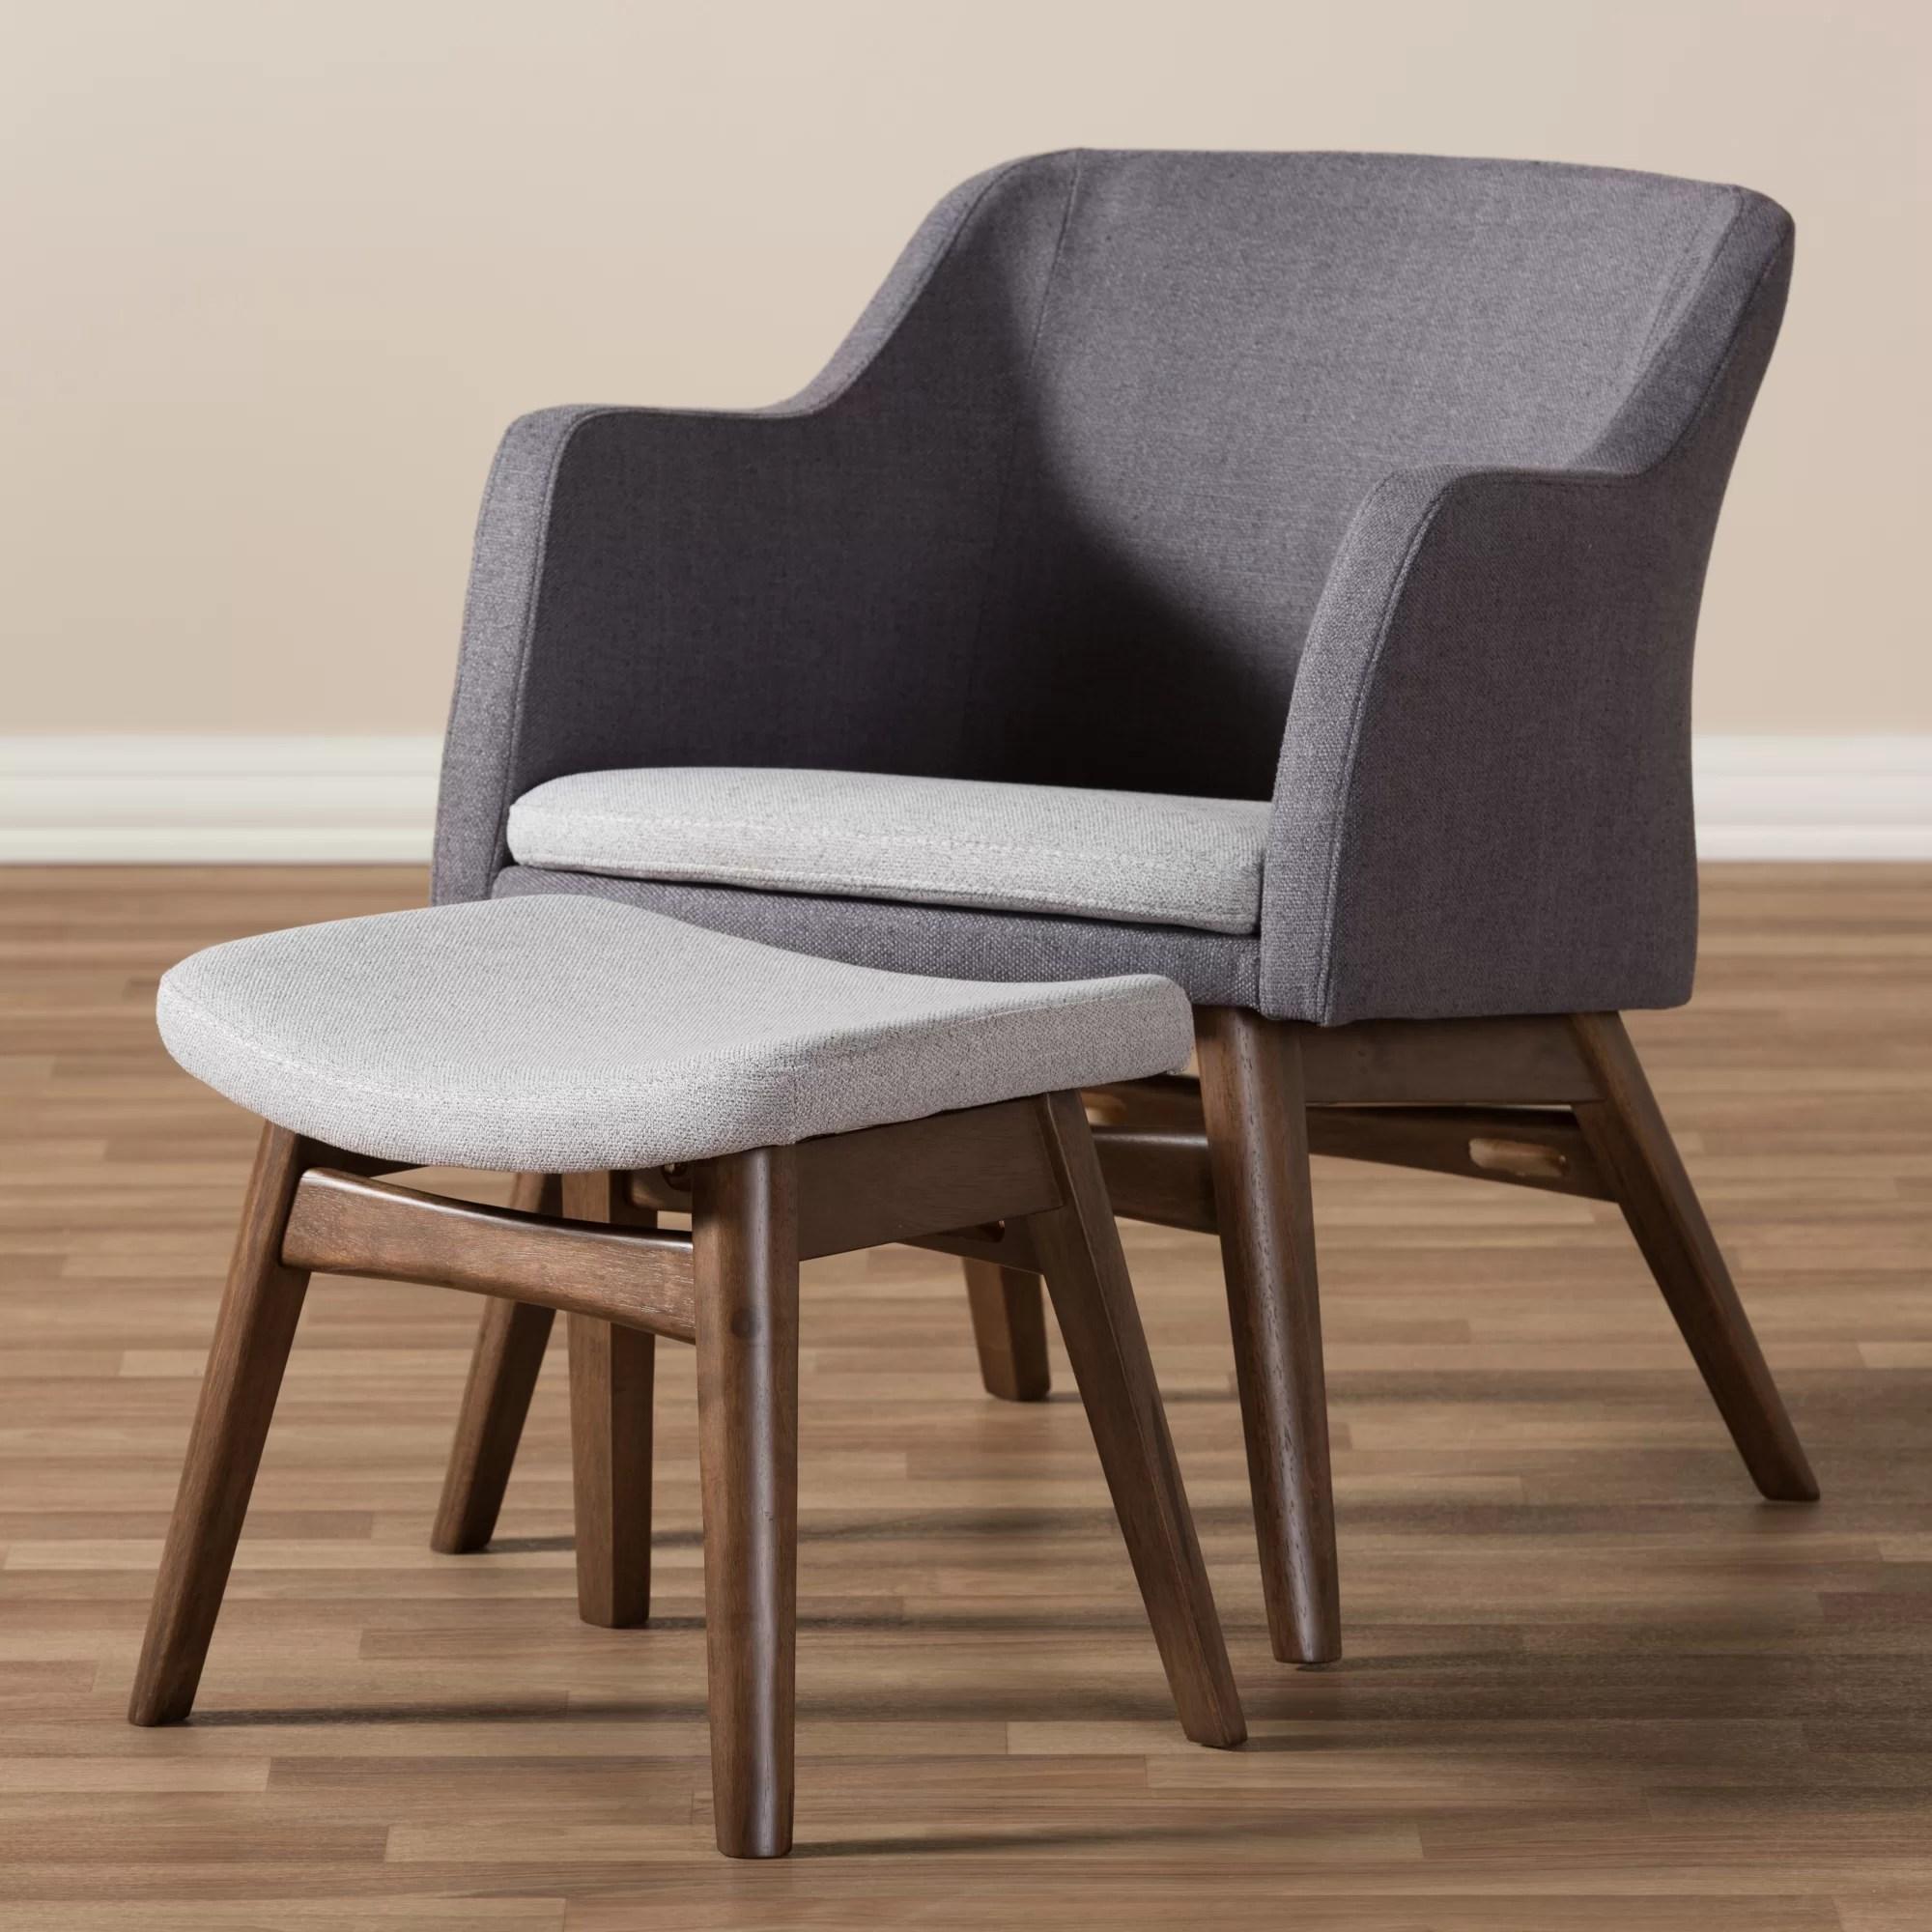 Designer Chair Vic English Victorian Furniture Interior Design